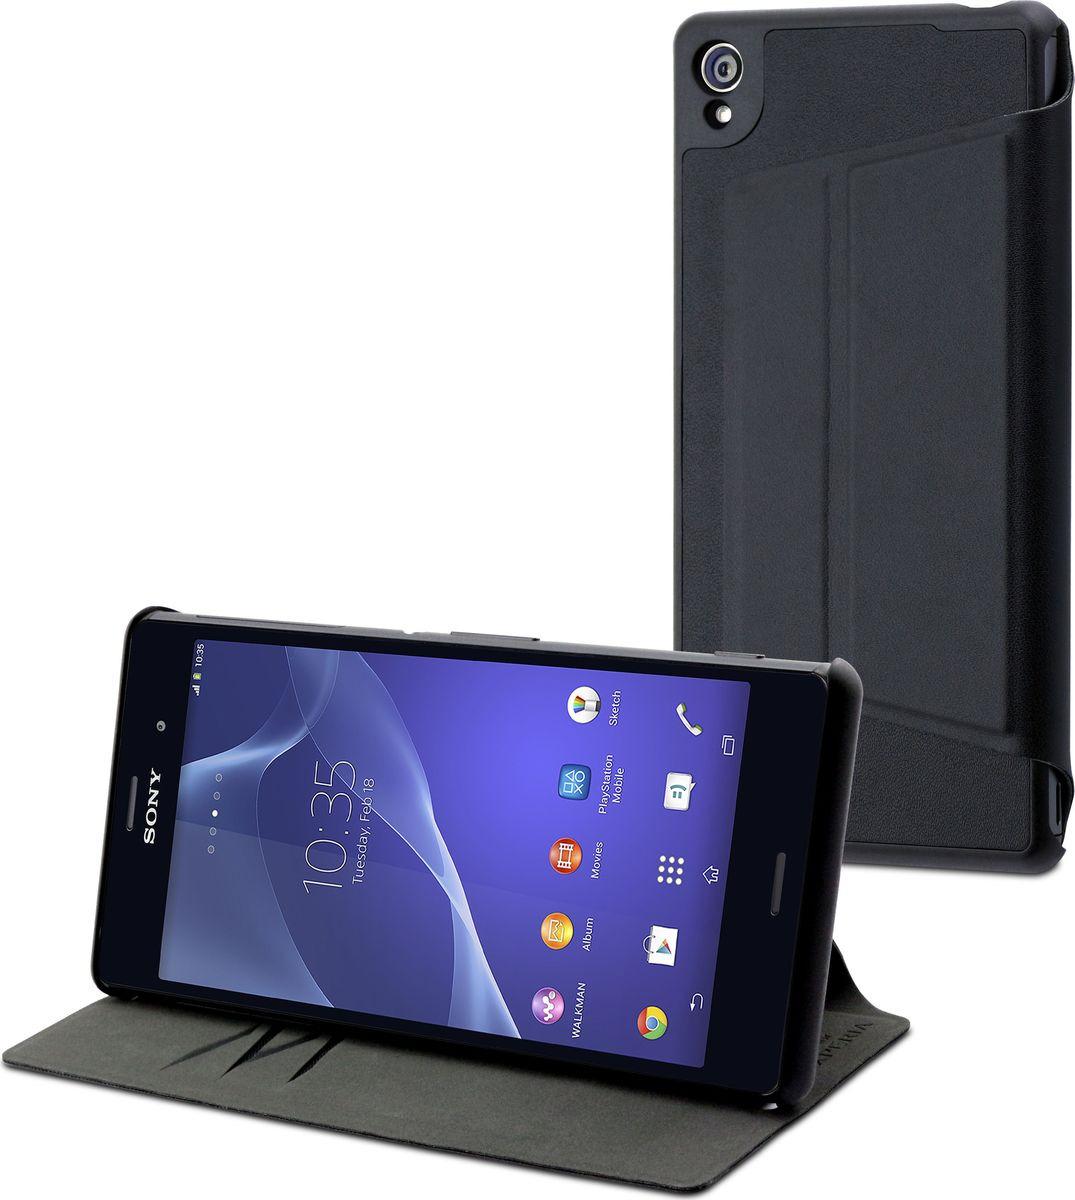 Чехол для сотового телефона Muvit MFX Stand Folio для Sony Xperia Z3, SESLI0130, черный цены